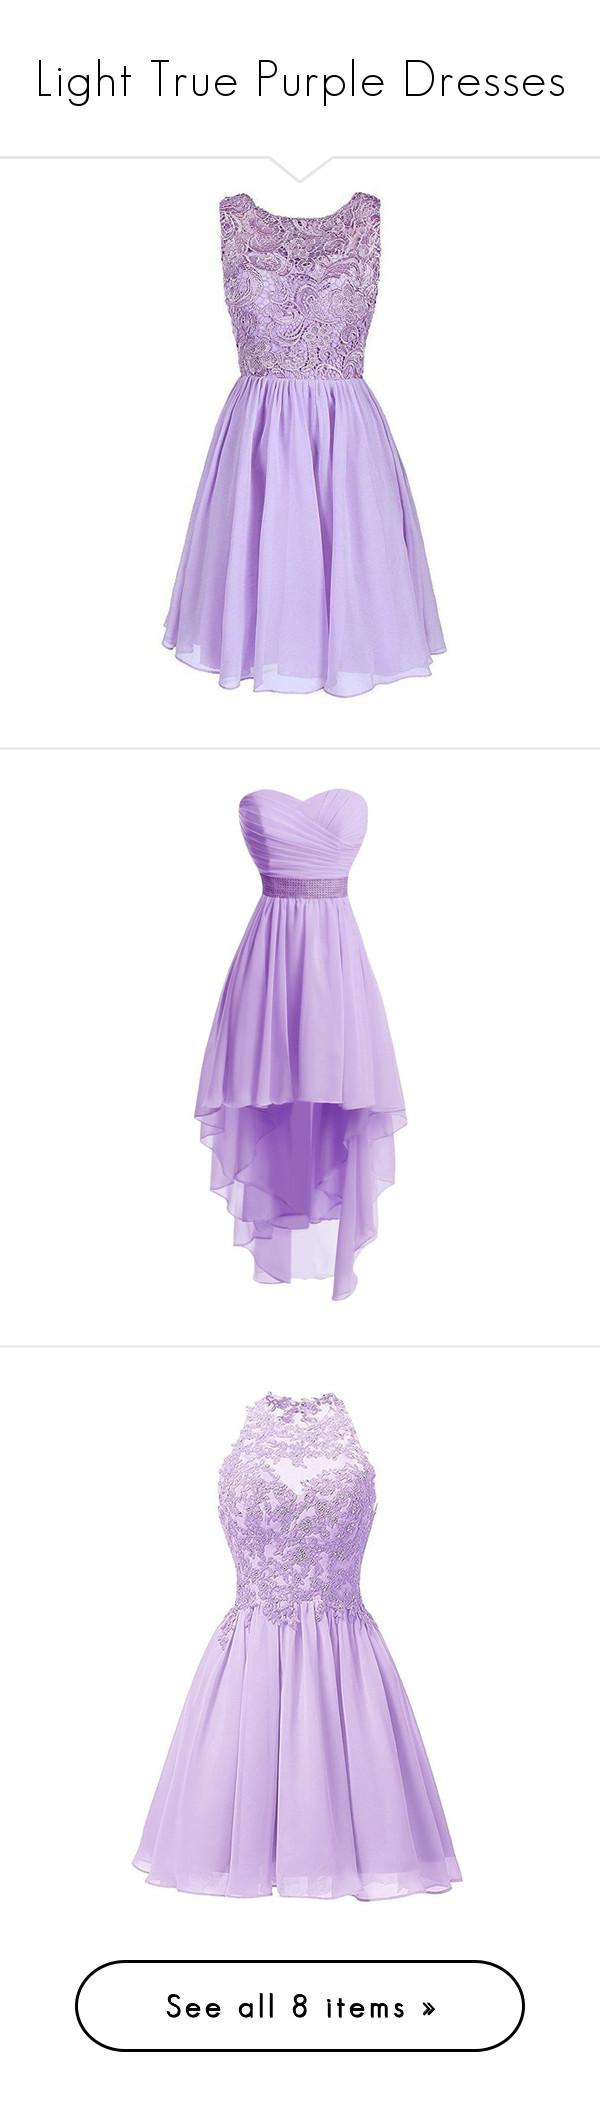 Light true purple dresses